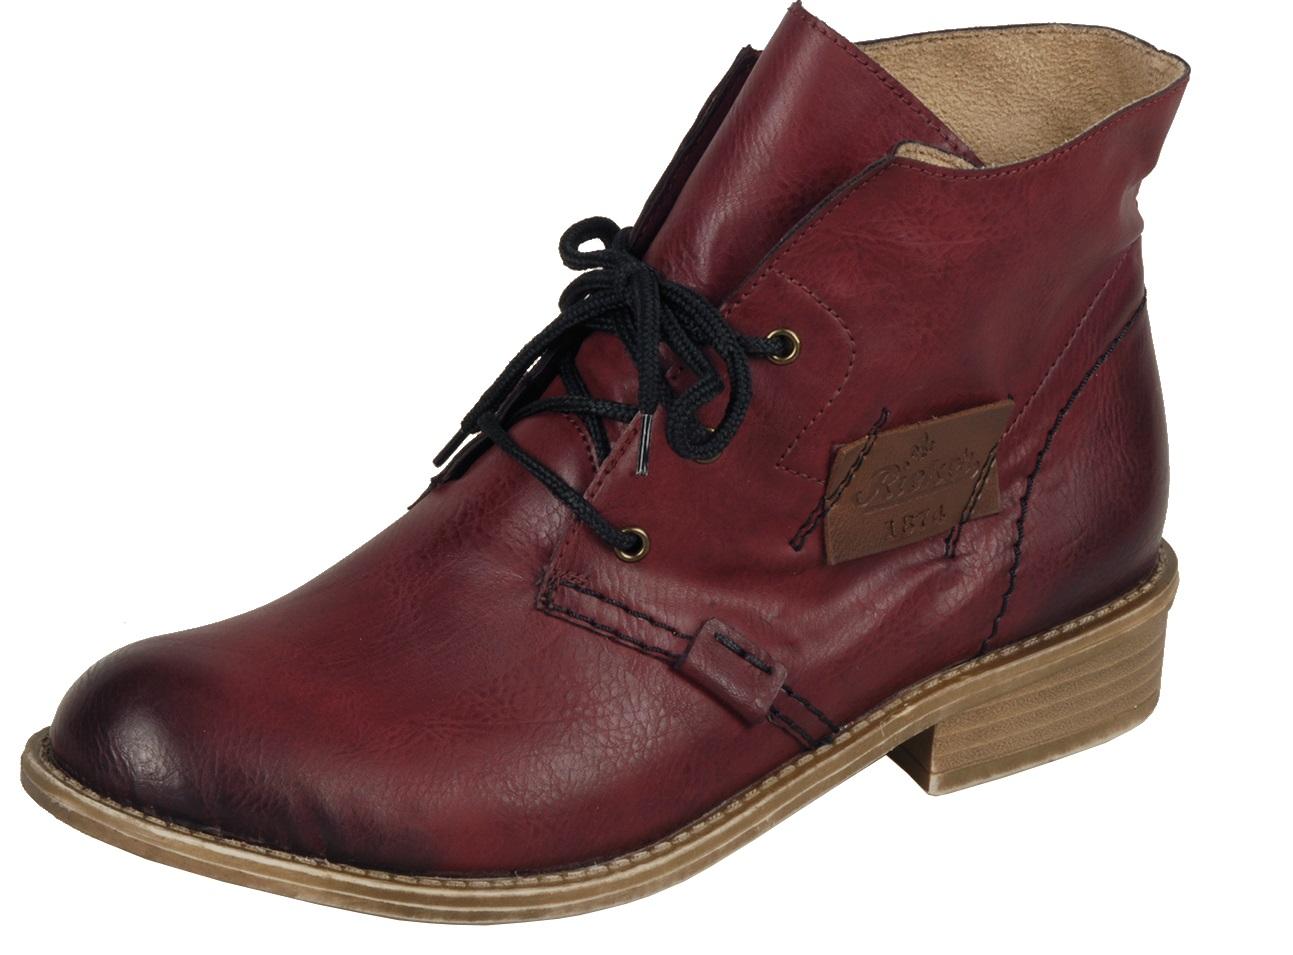 rieker stiefel winterstiefel boots rot leder neu 72740 35 samtvelour futter neu ebay. Black Bedroom Furniture Sets. Home Design Ideas